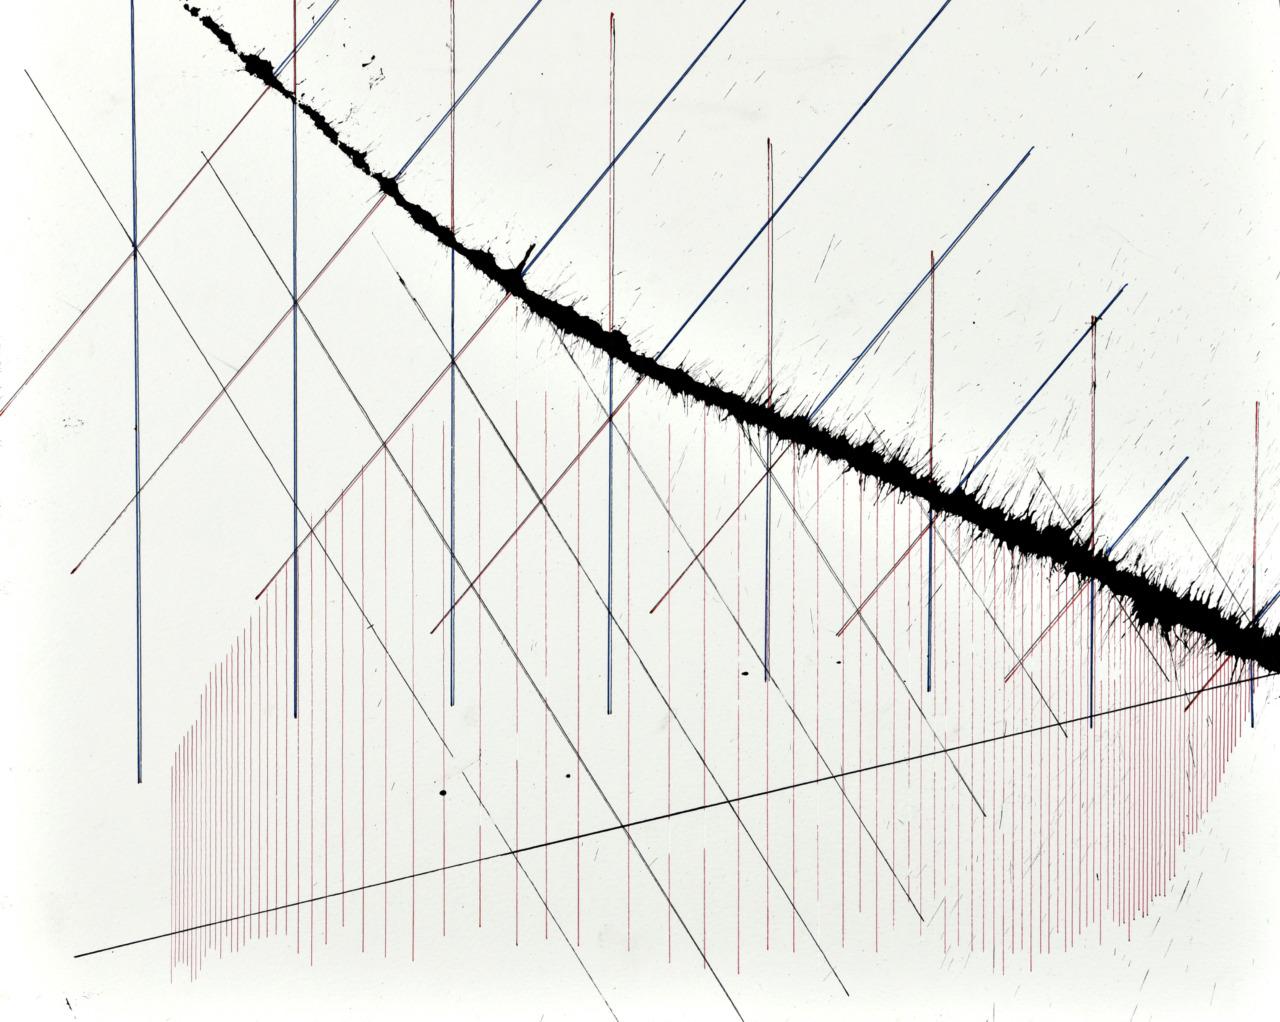 op180520. acrylic on paper, 40x50cm